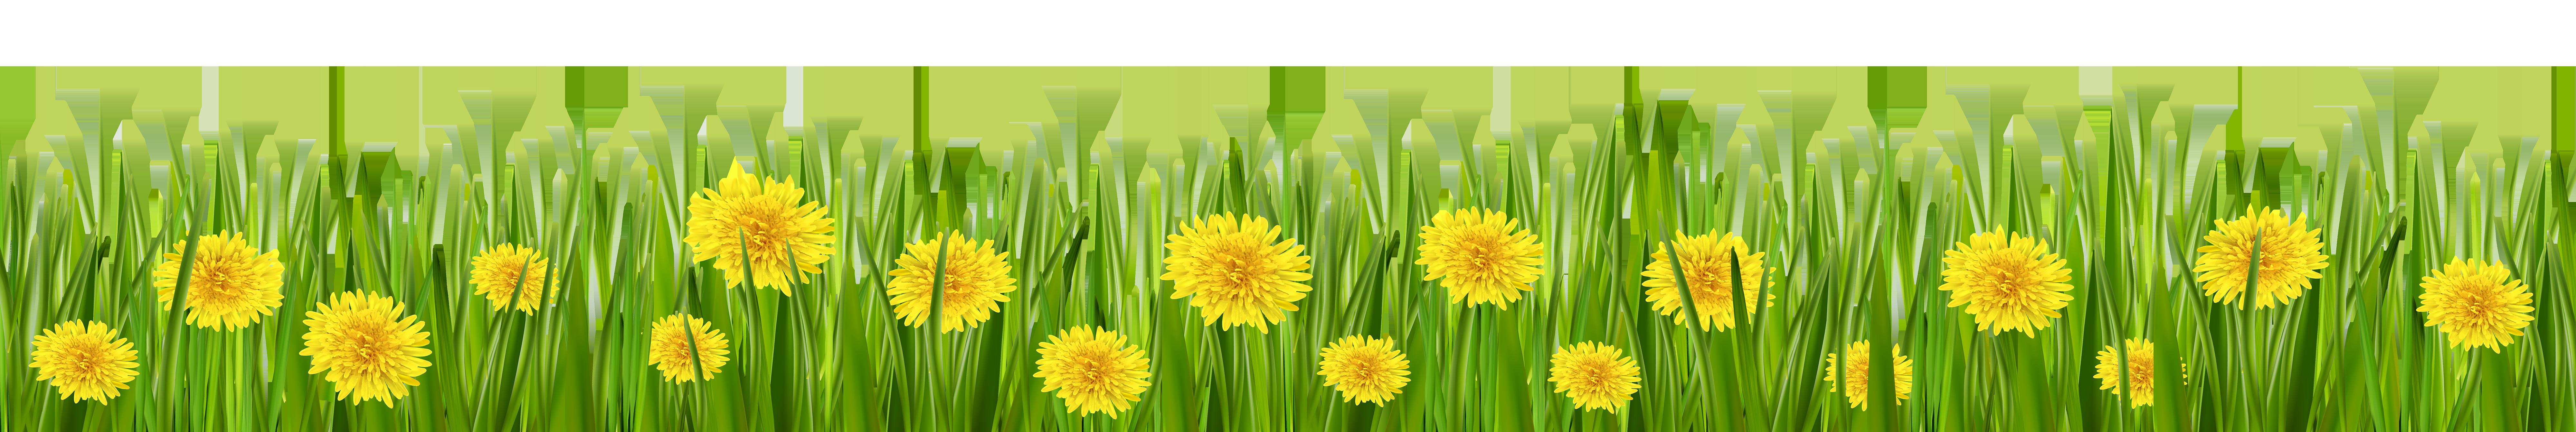 Sun dandilion birds clipart jpg freeuse library Grass and Dandelions PNG Clip Art - Best WEB Clipart jpg freeuse library